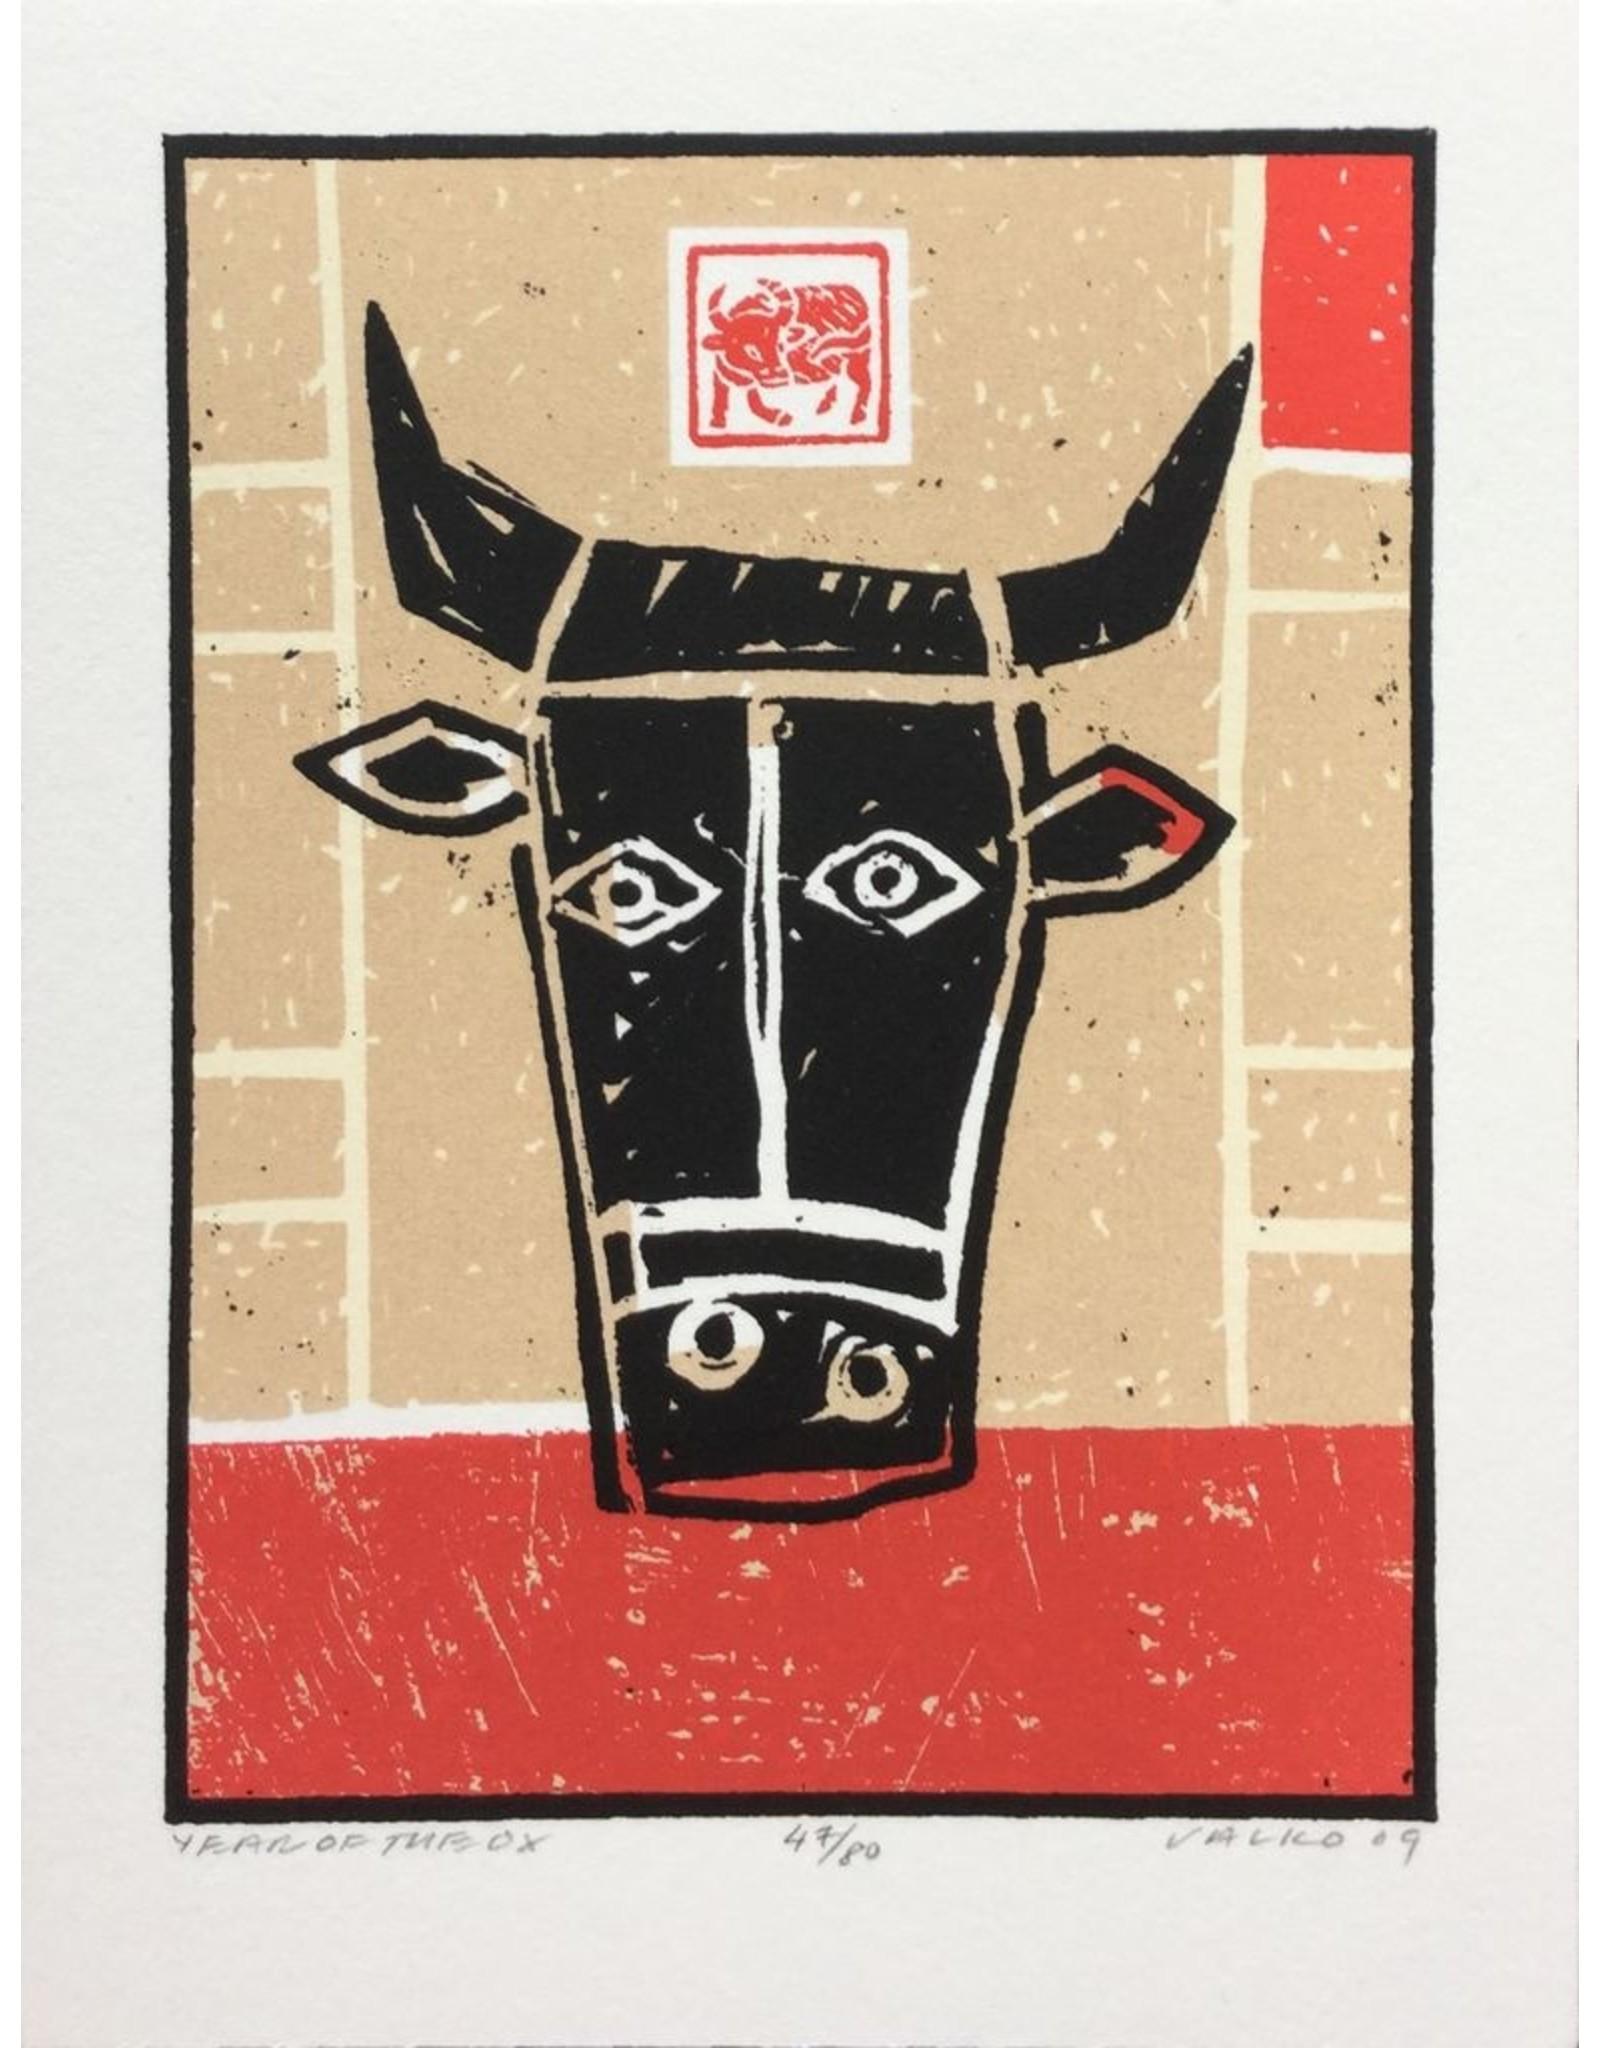 Valko, Andrew Year of the Ox, Andrew Valko